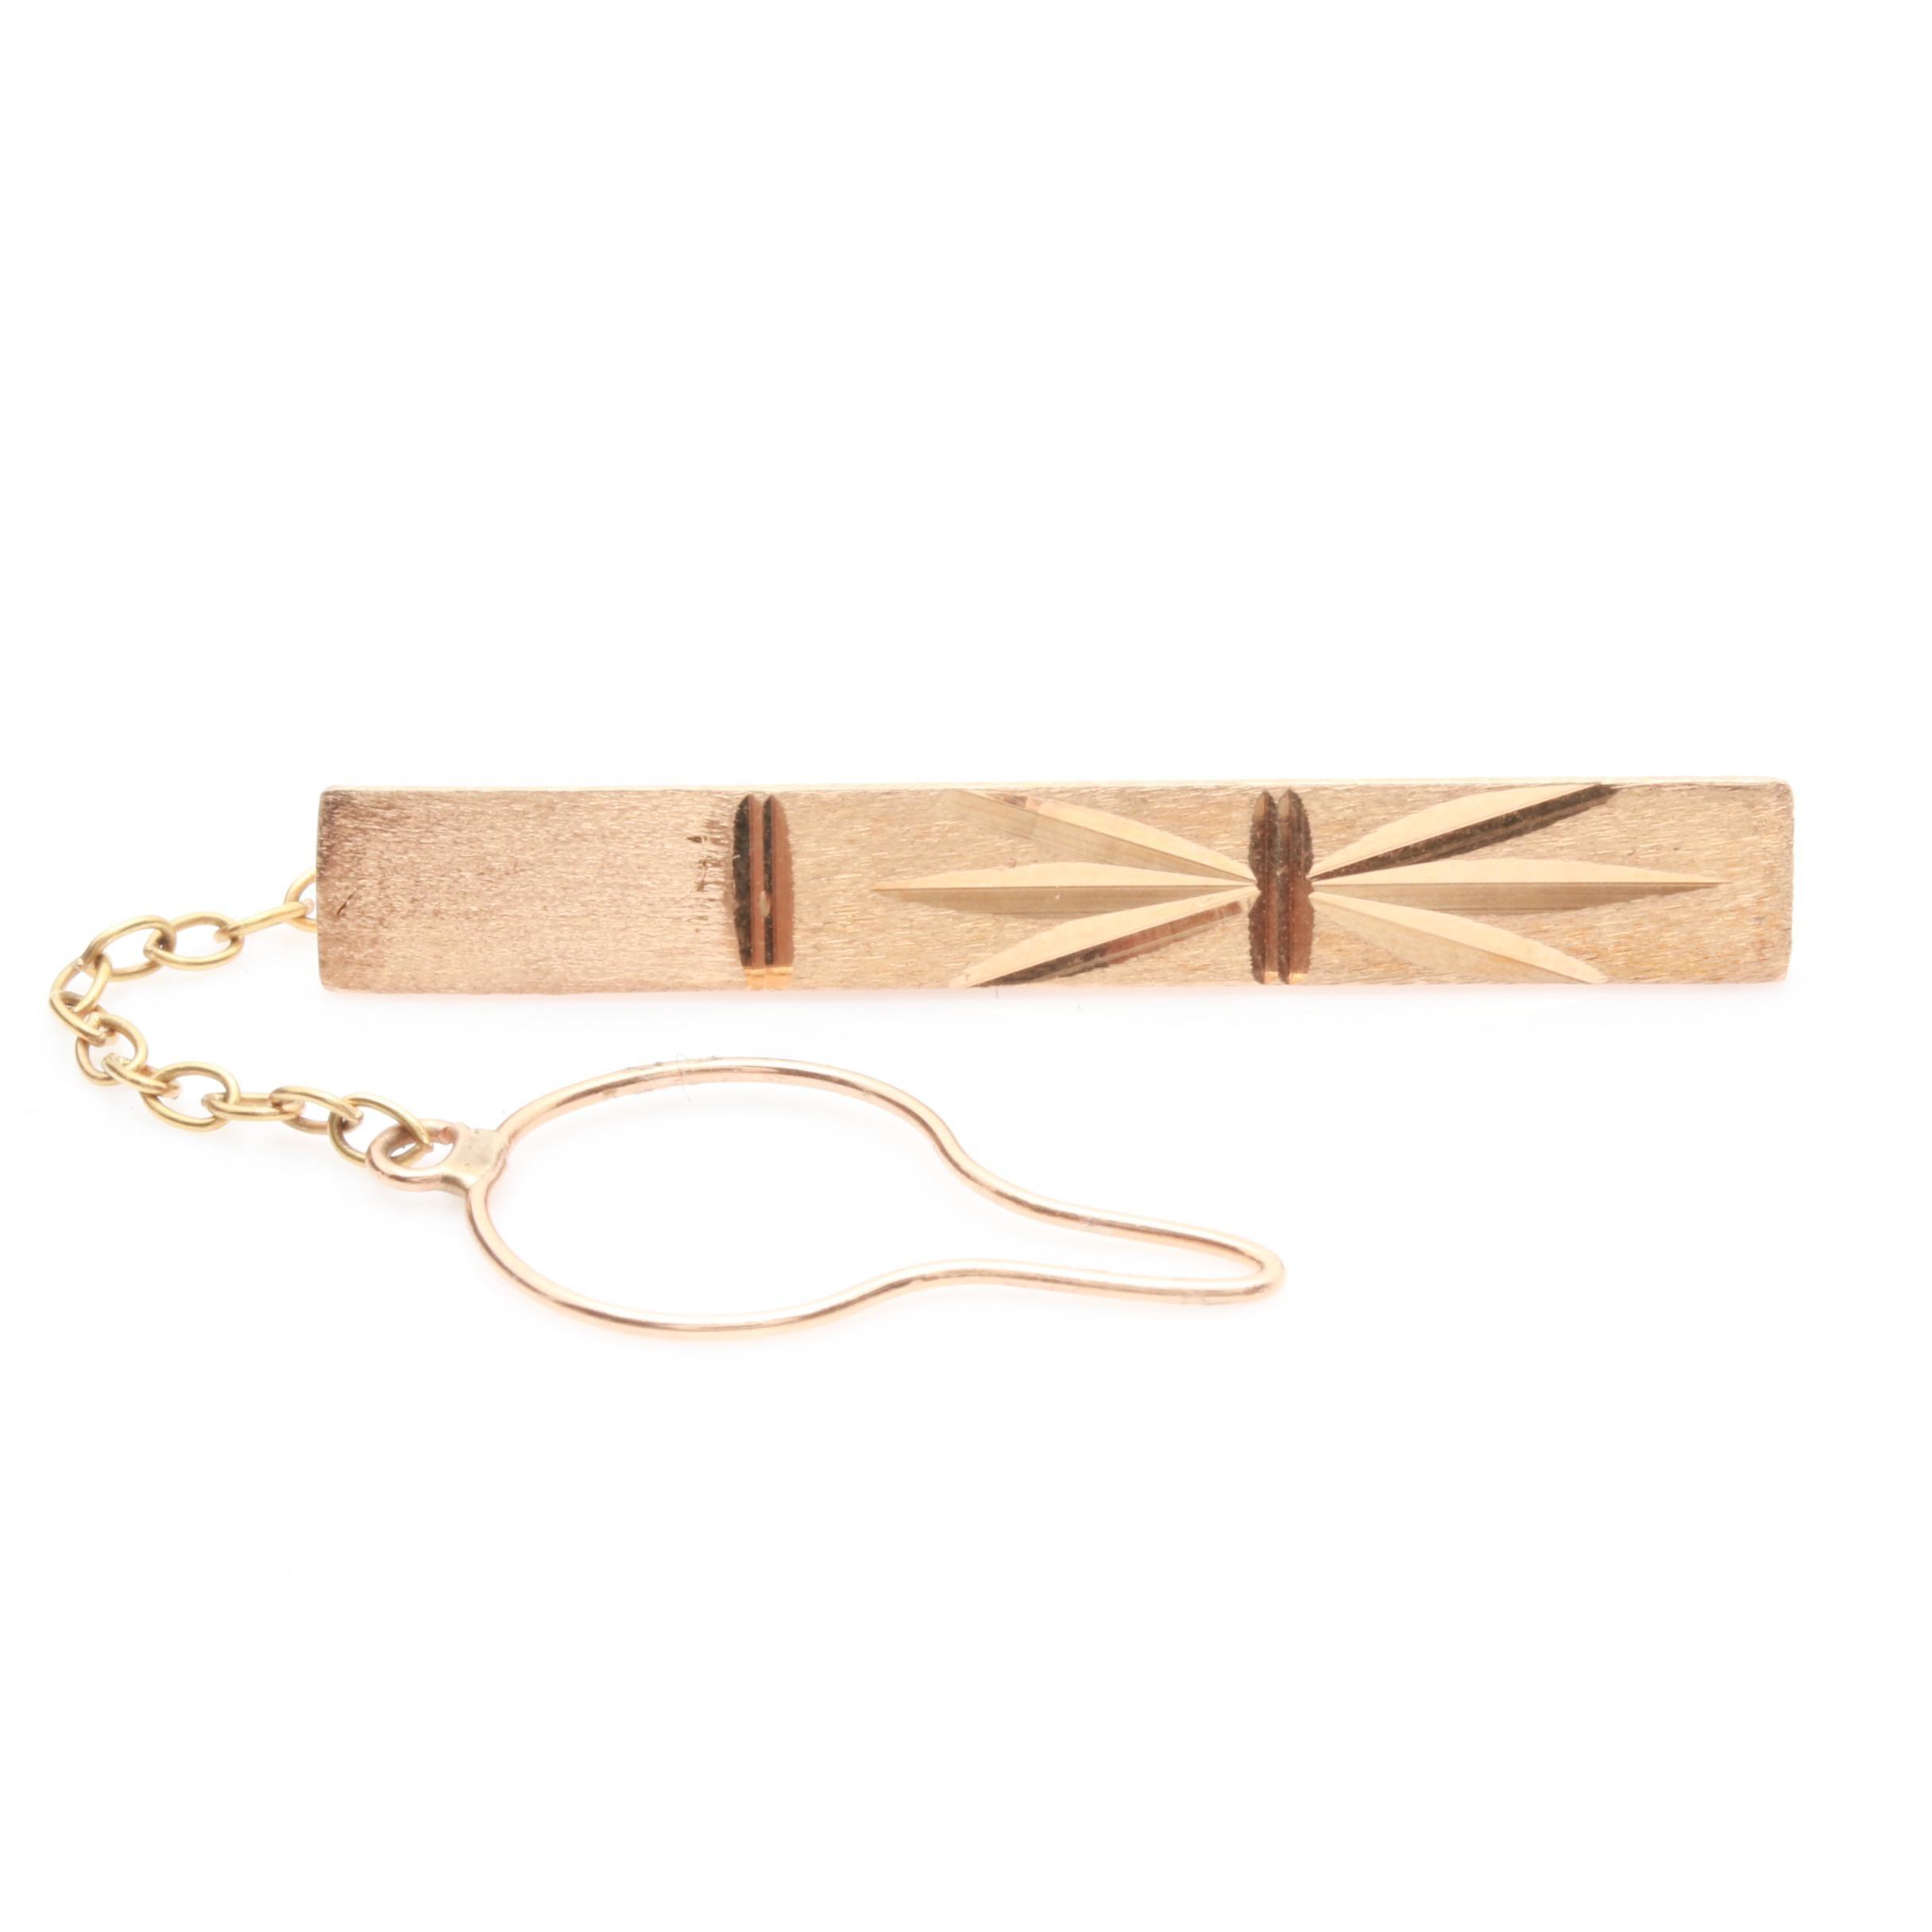 18K Rose Gold Tie Clip